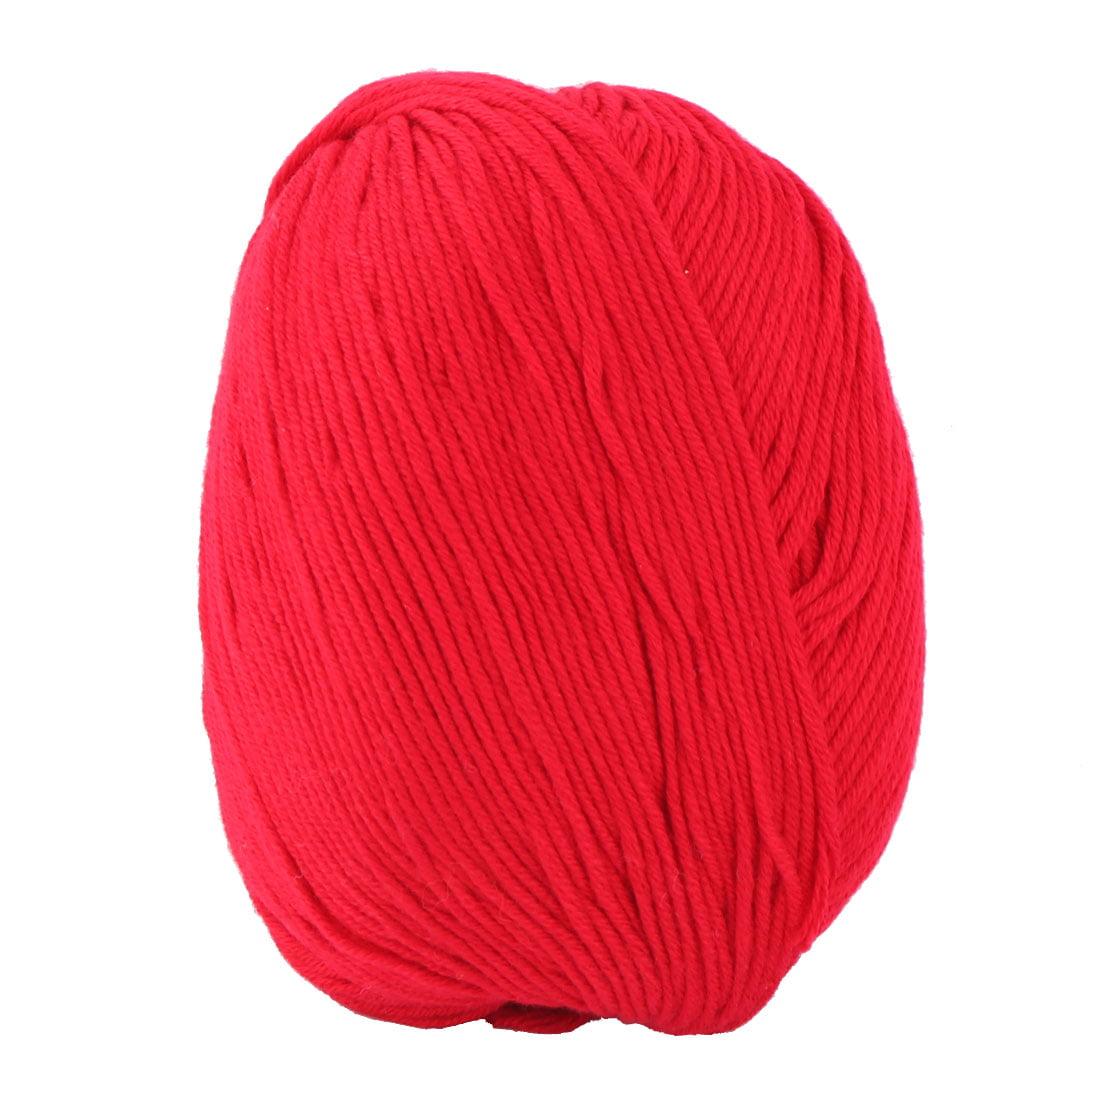 Acrylic Fiber Scarf Handicraft Gift Knitting Needle Weaving Yarn Dark Red 50g